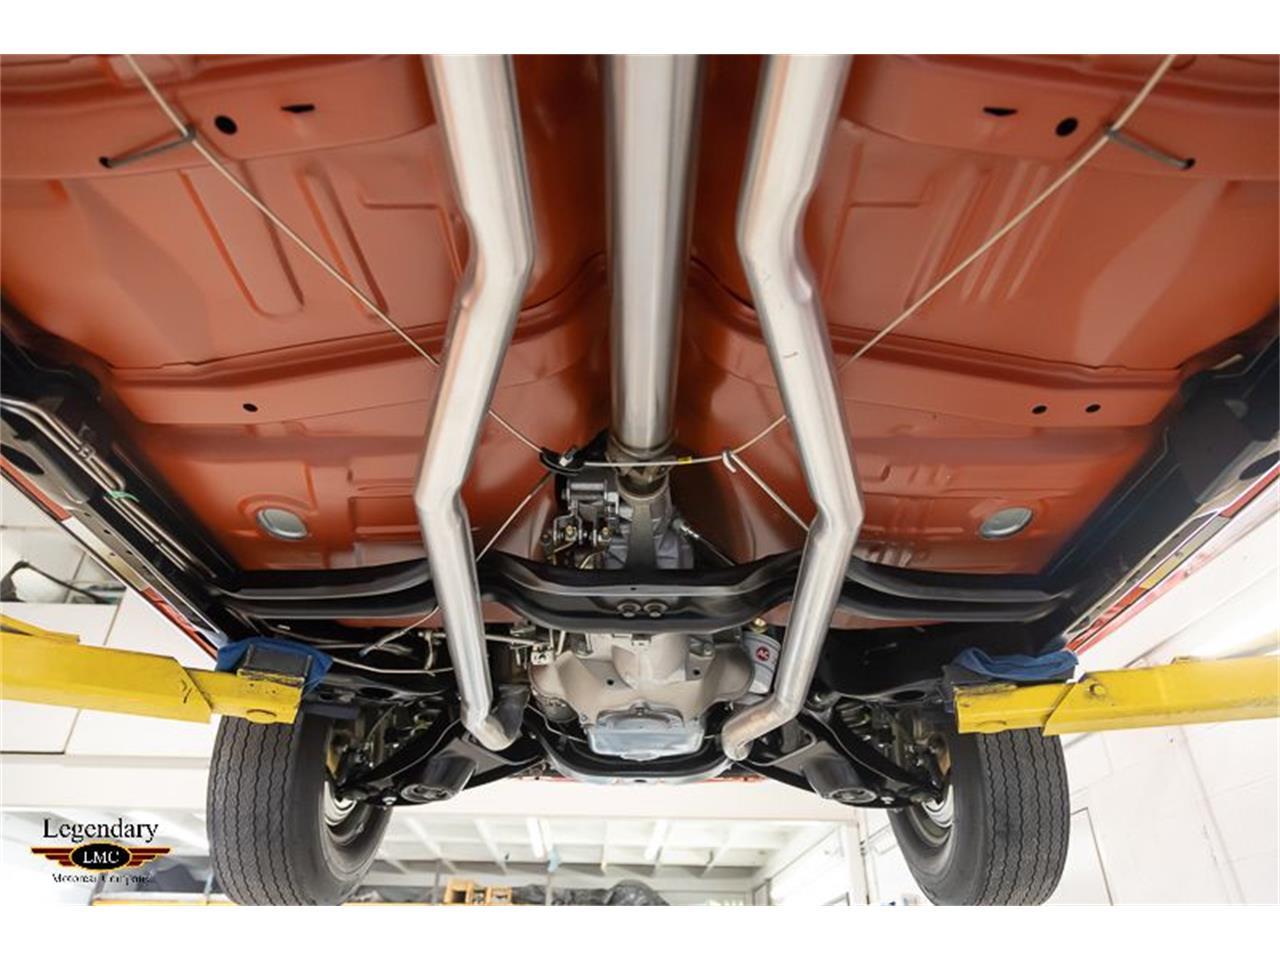 1969 Pontiac GTO (The Judge) (CC-1308686) for sale in Halton Hills, Ontario